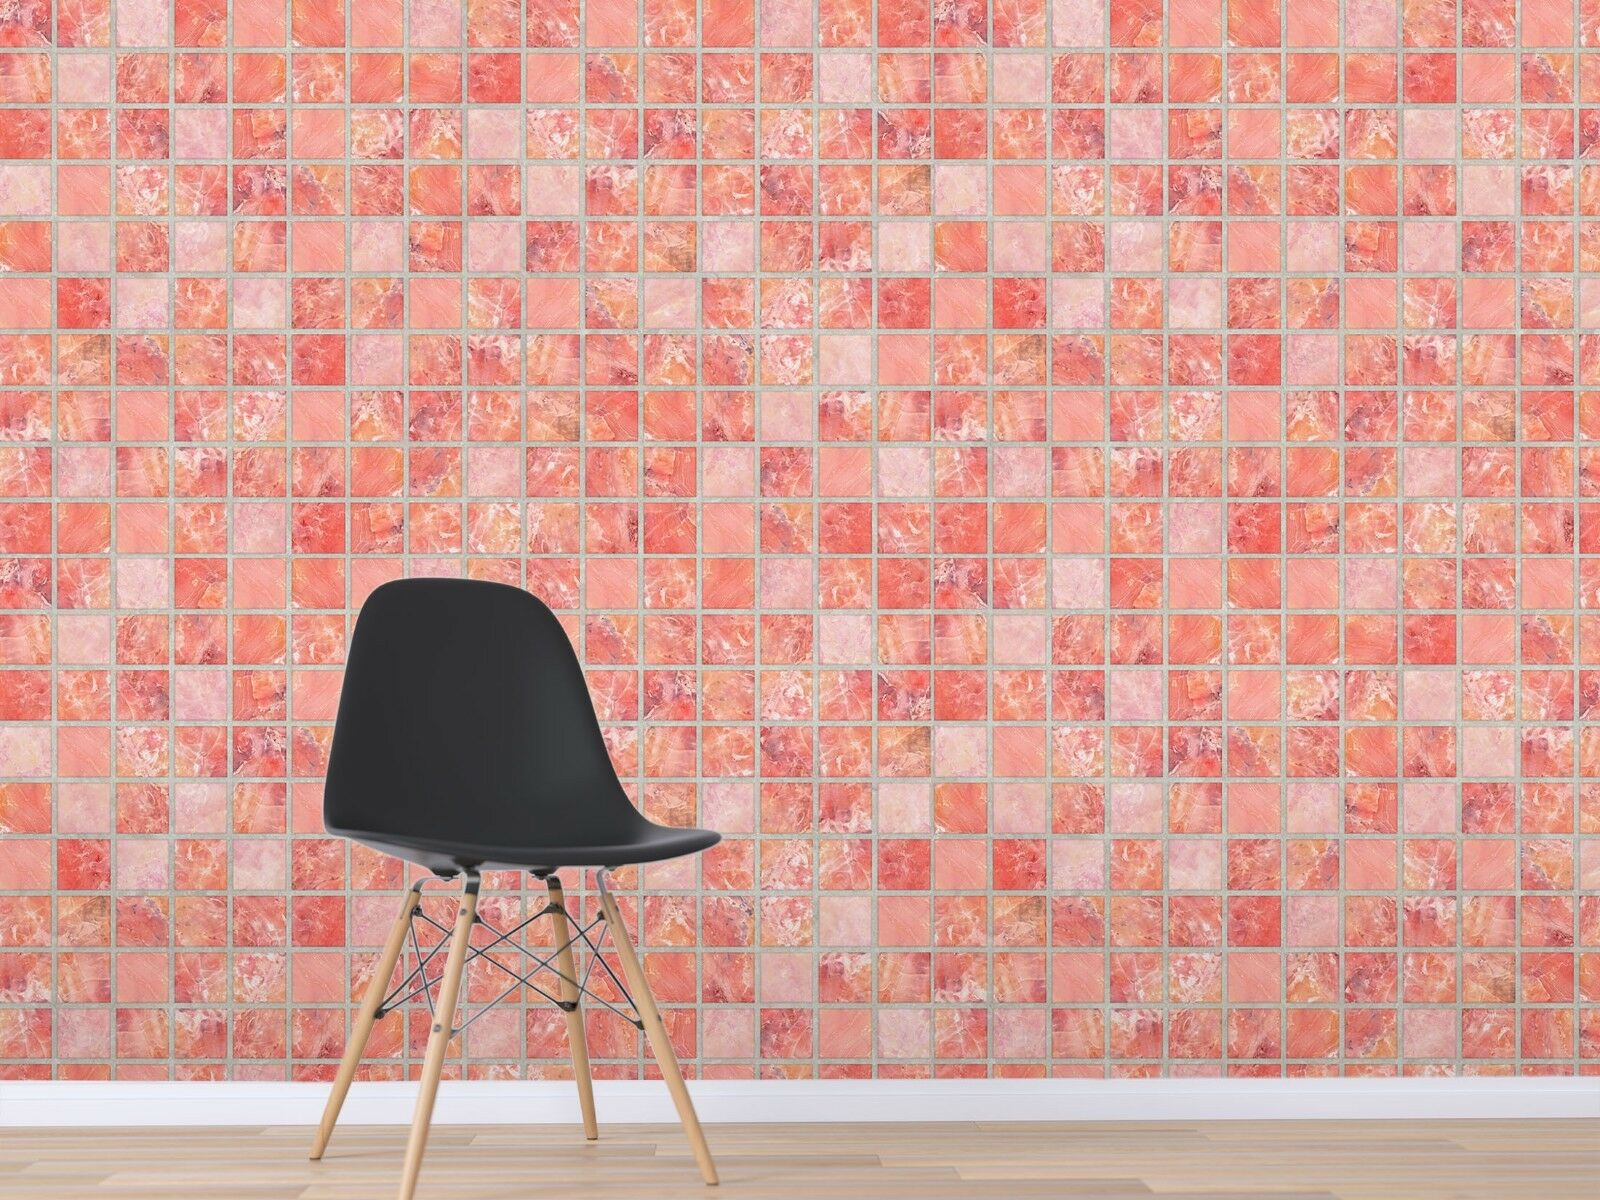 3D Hellpink Quadrat 3 Textur Fliesen Marmor Tapeten Abziehbild Tapete Wandbild